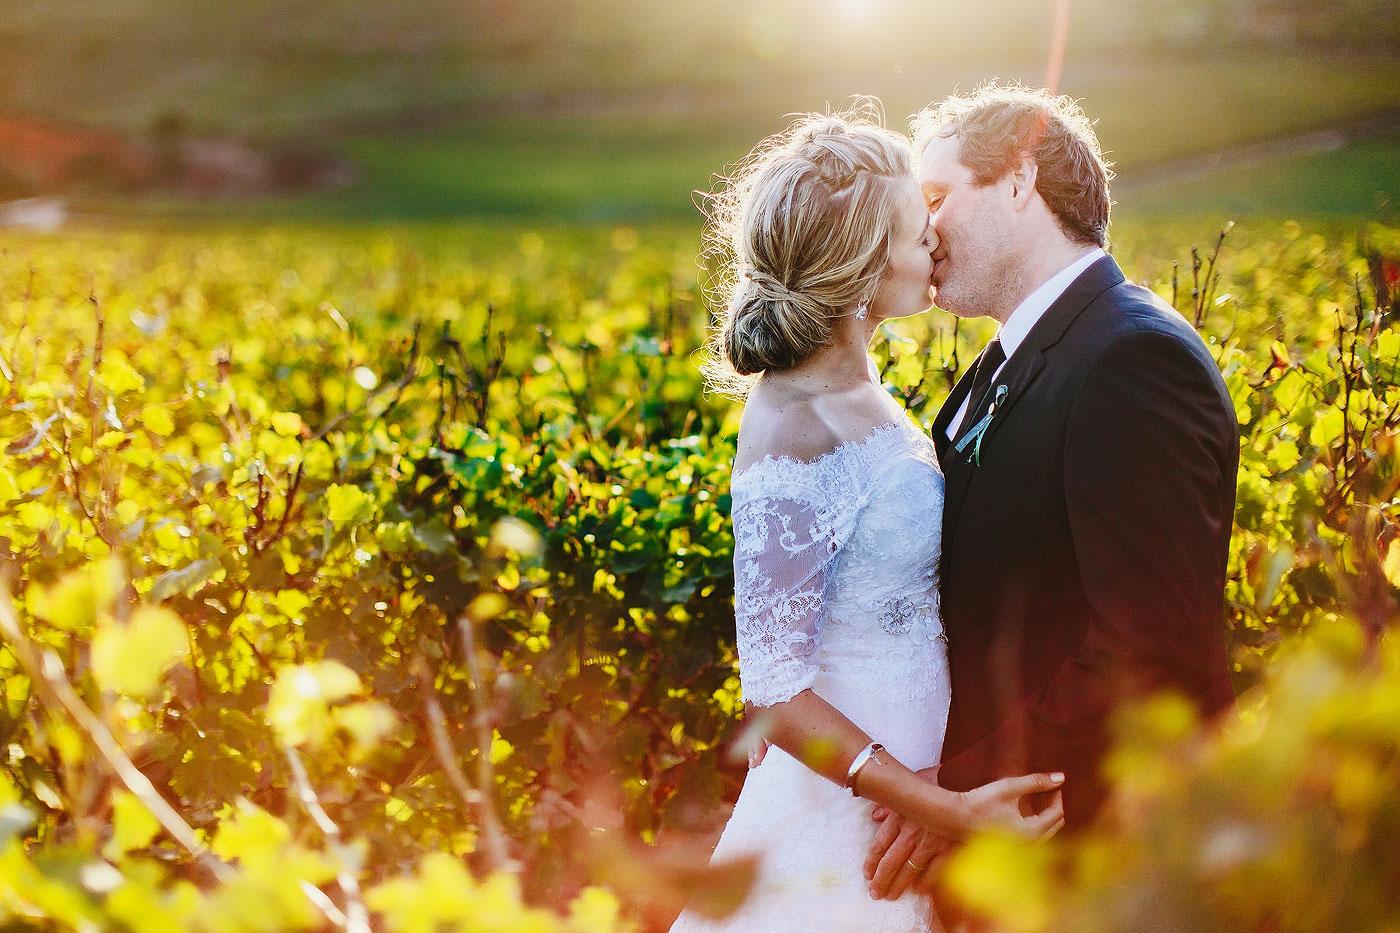 Wedding Couple Portrait in A Vineyard